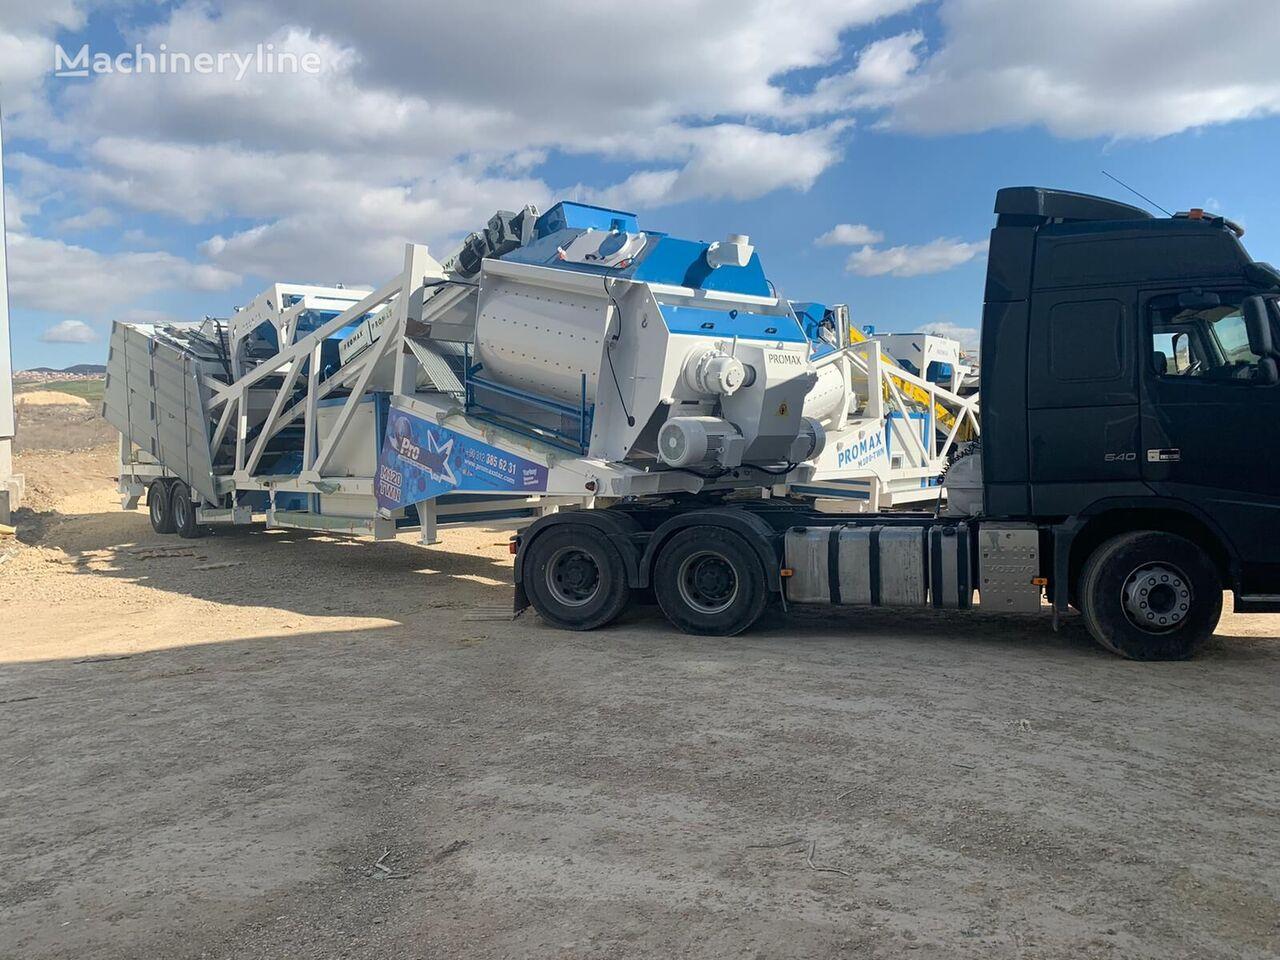 nový betonáreň PROMAX Mobile Concrete Batching Plant M120-TWN (120m3/h)